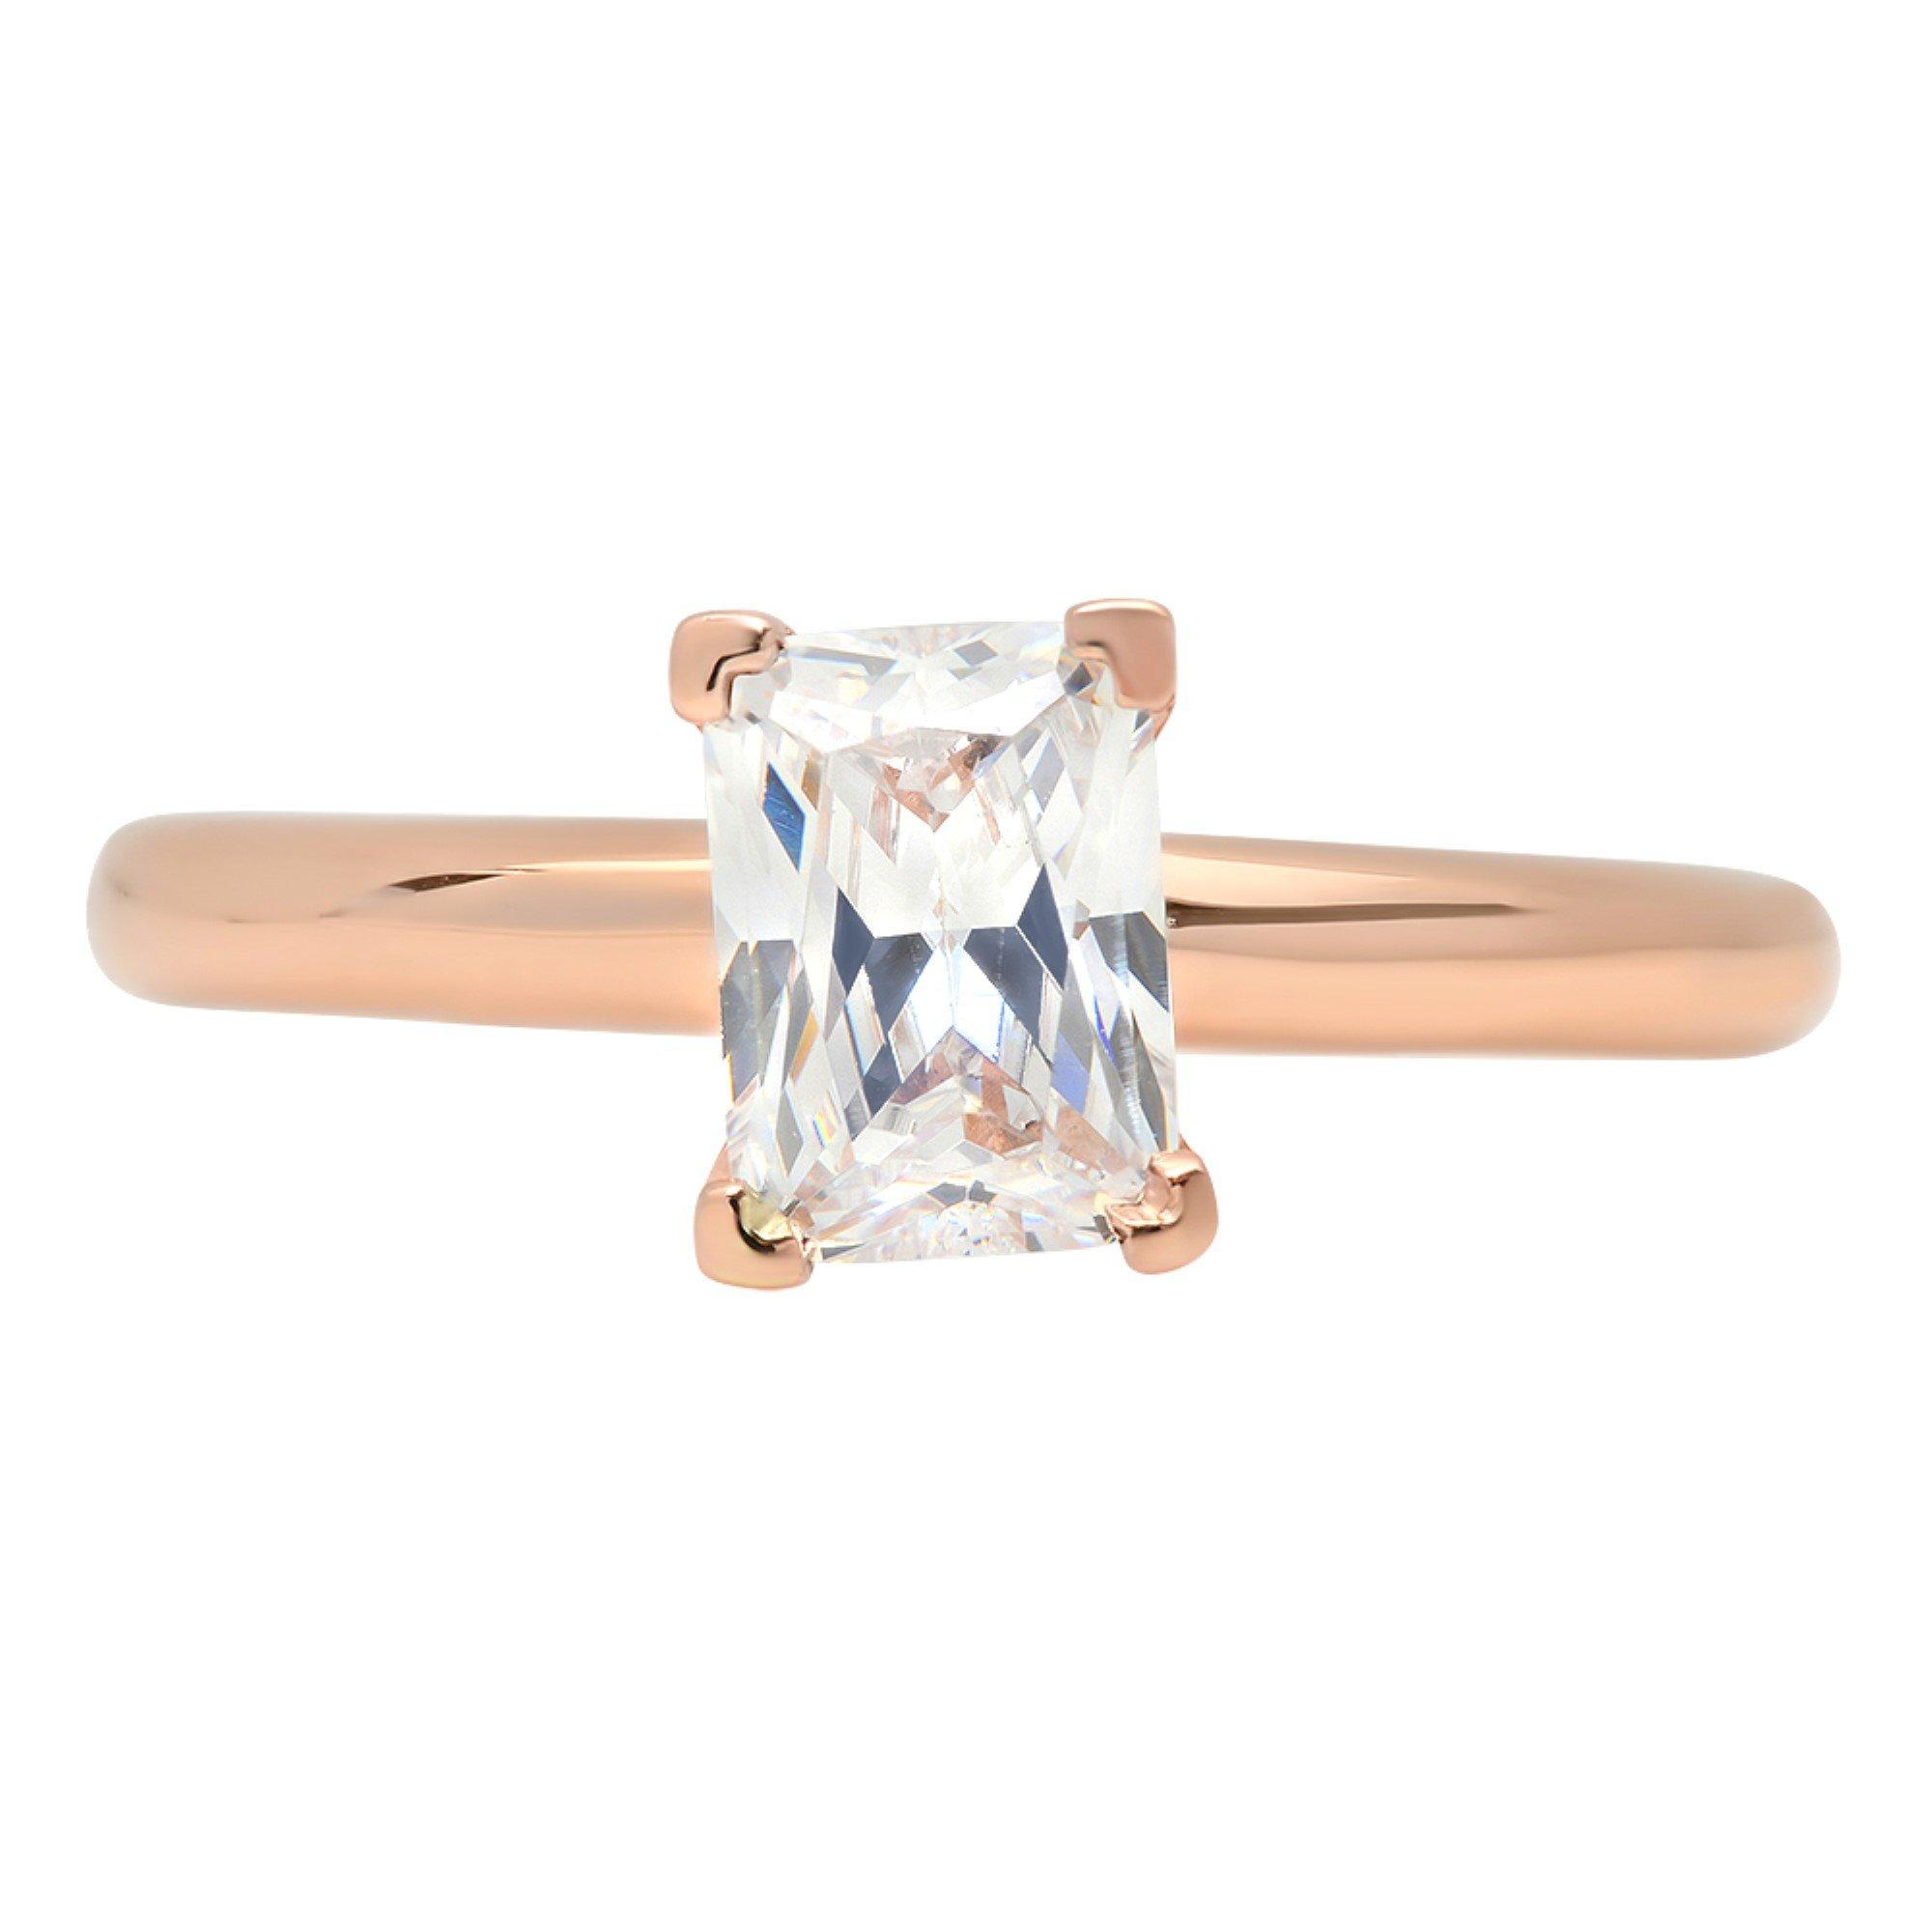 1.1ct Brilliant Emerald Cut Solitaire Statement Ring 14k Rose Gold, 7.75, Clara Pucci